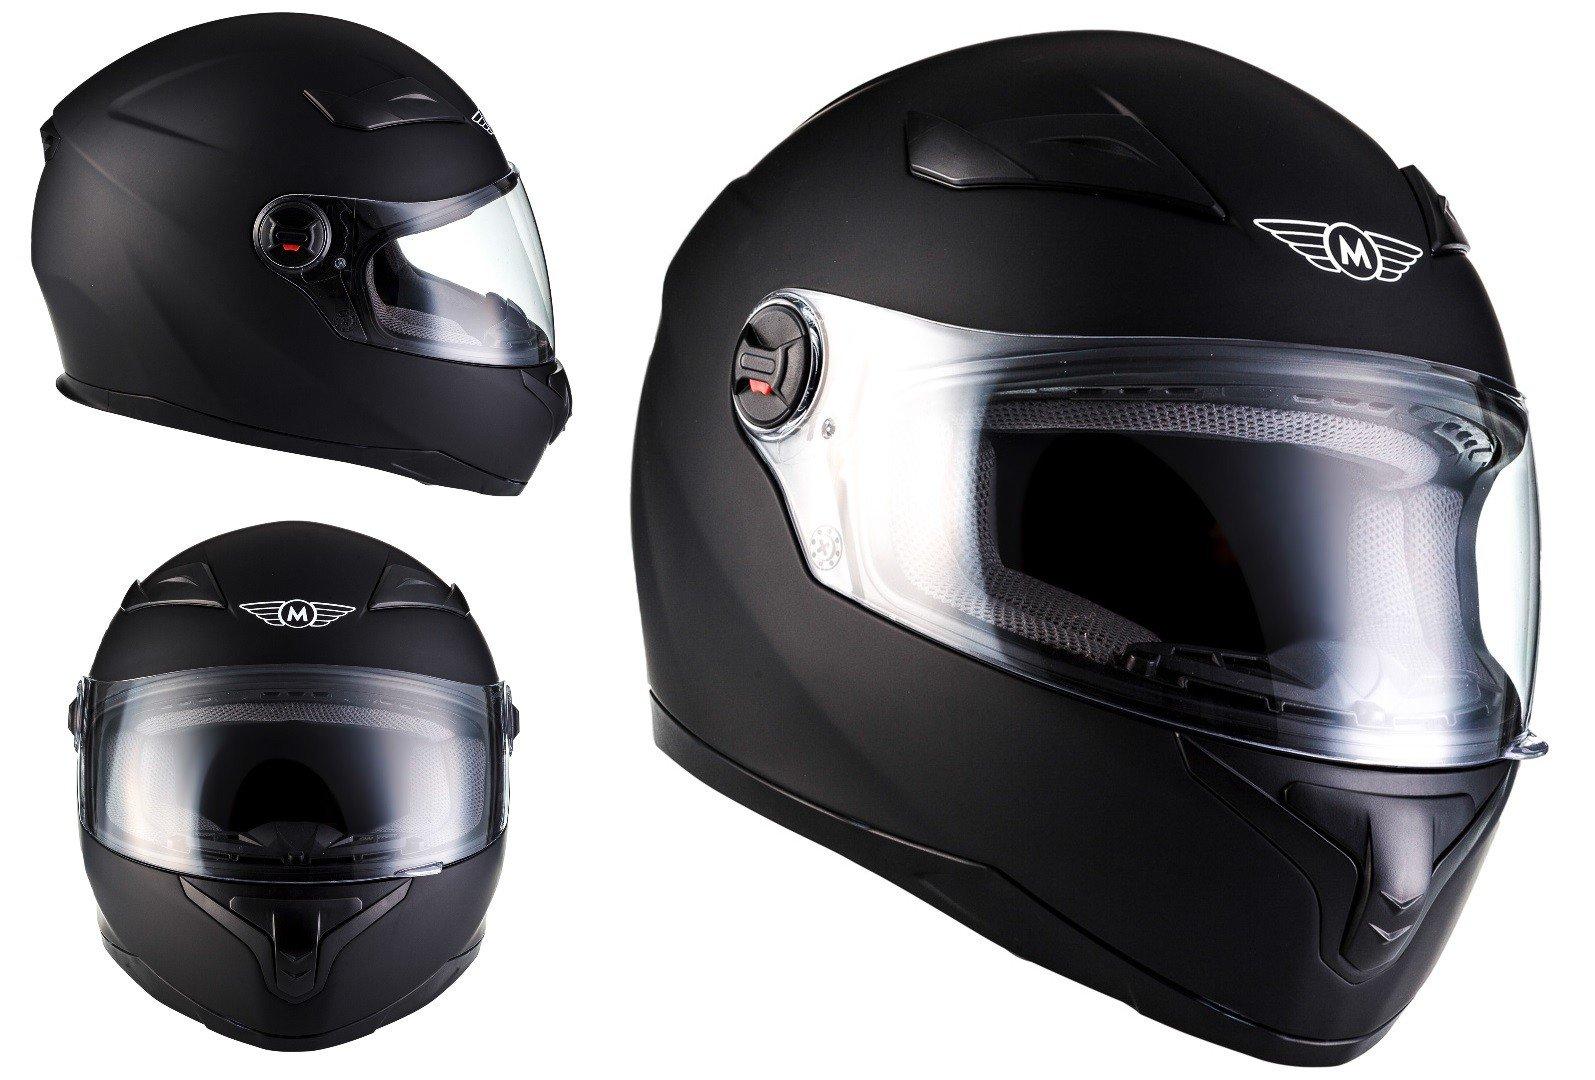 MOTO X86 Matt Black · Cruiser Fullface-Helmet Moto motocicleta Urban Urbano Scooter Sport Casco